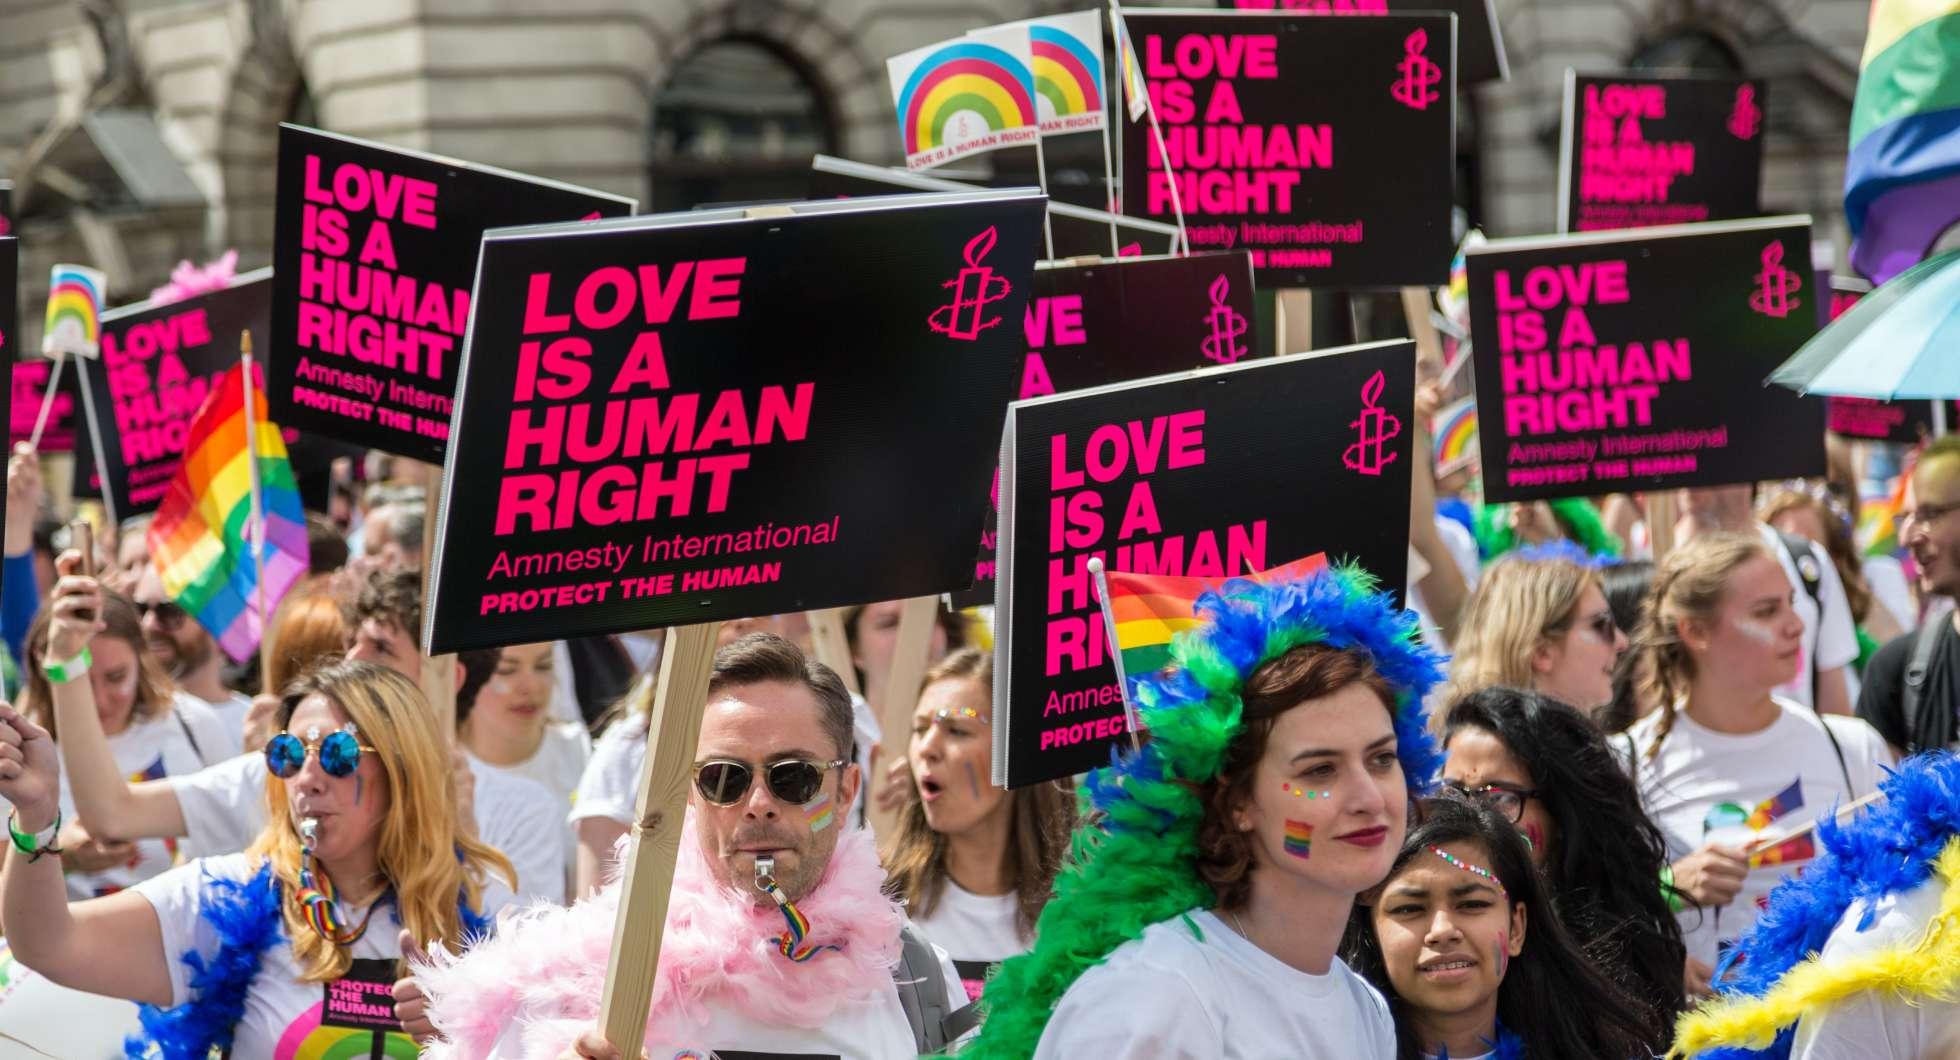 London pride parade 2016 (Photo by Ian Taylor on Unsplash)